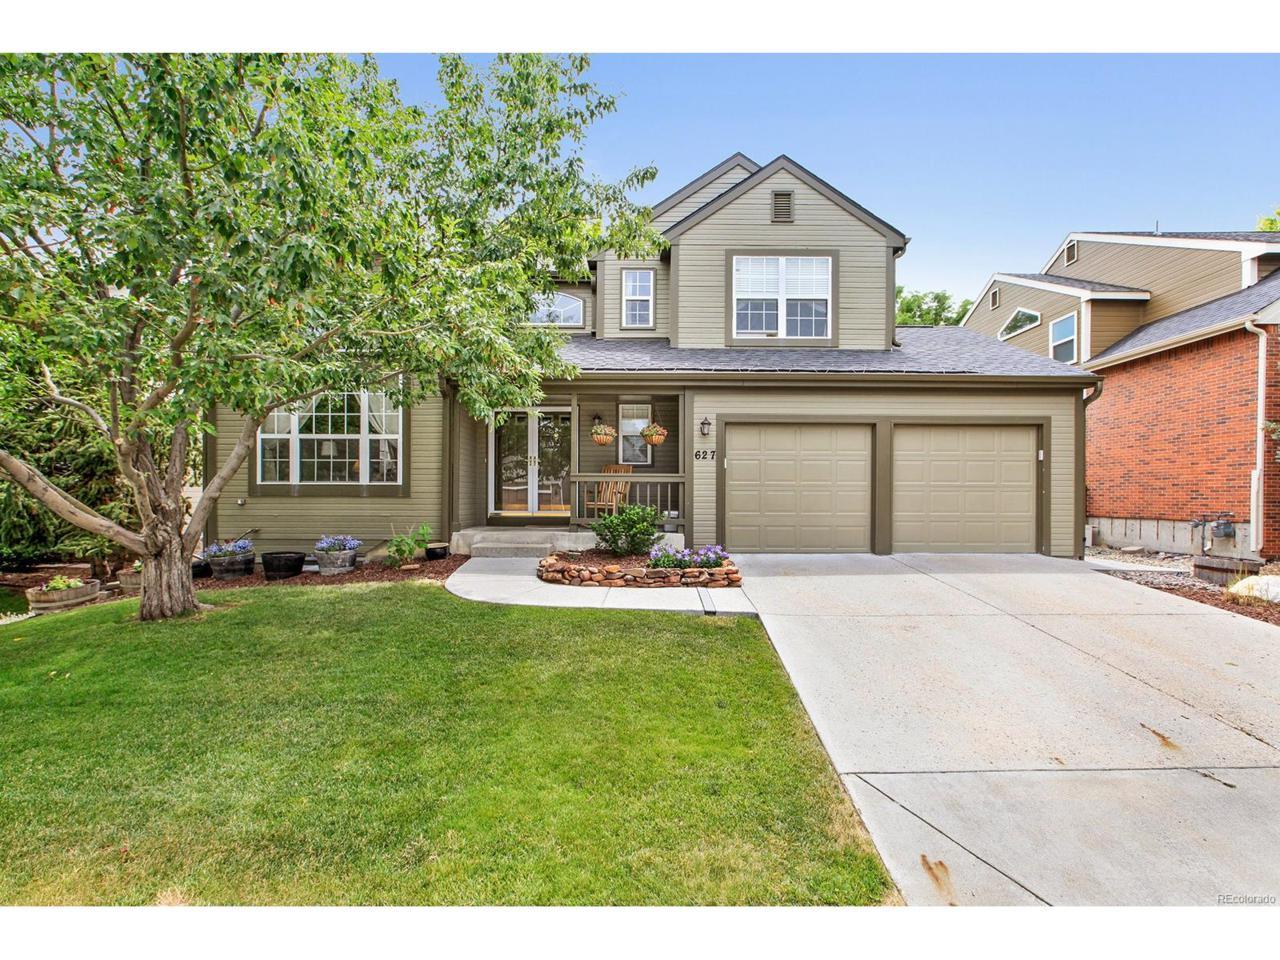 627 Huntington Drive, Highlands Ranch, CO 80126 (MLS #2007550) :: 8z Real Estate